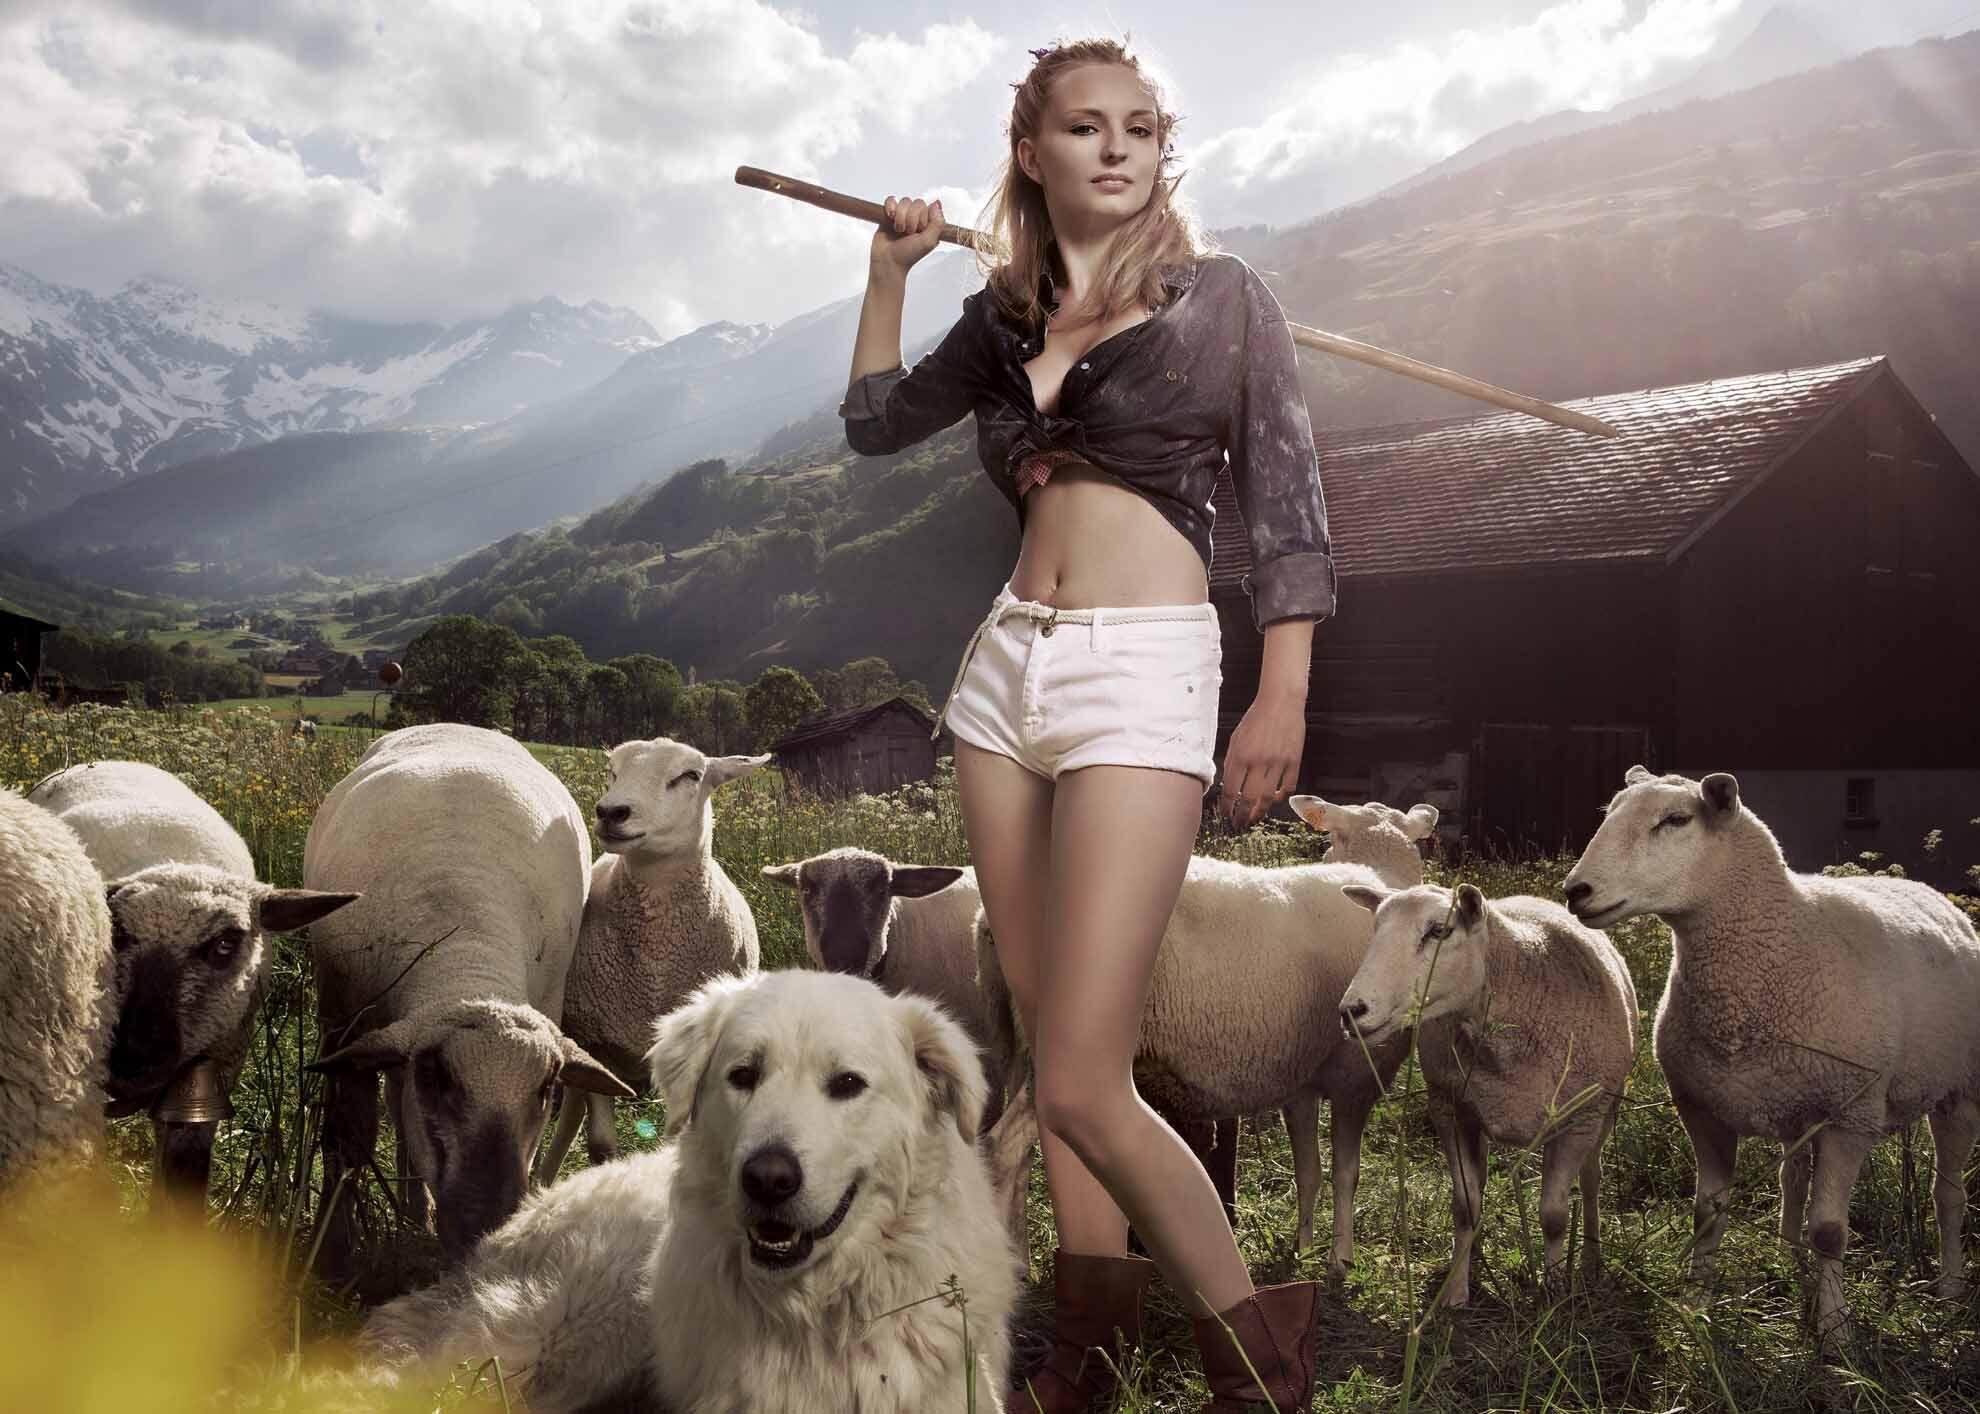 Farm girl hot 11